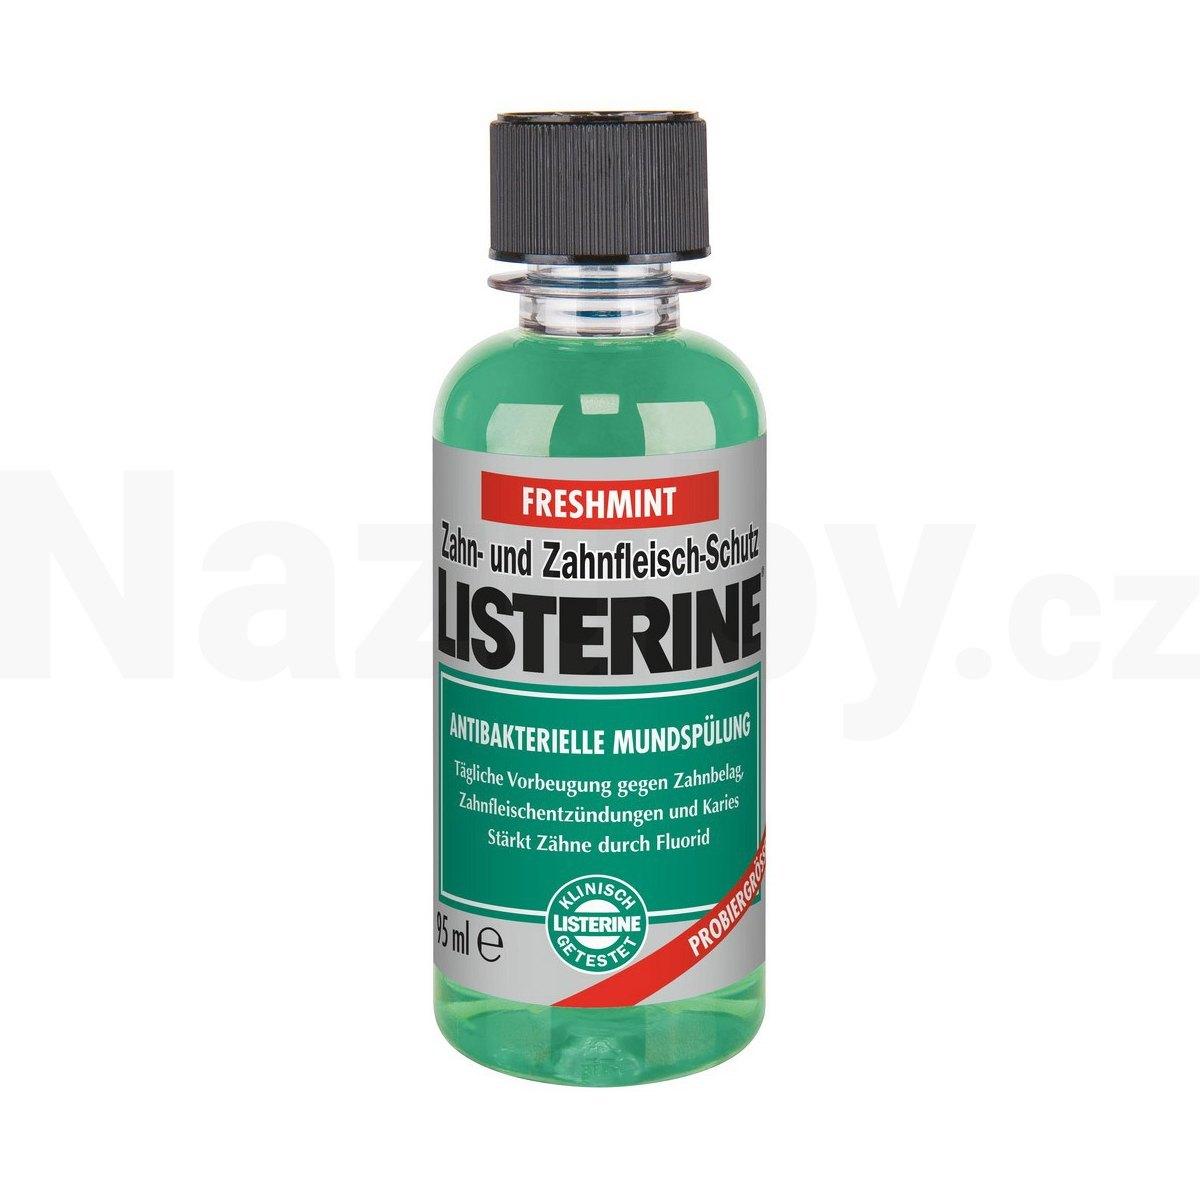 Listerine FreshMint ústní voda 95 ml